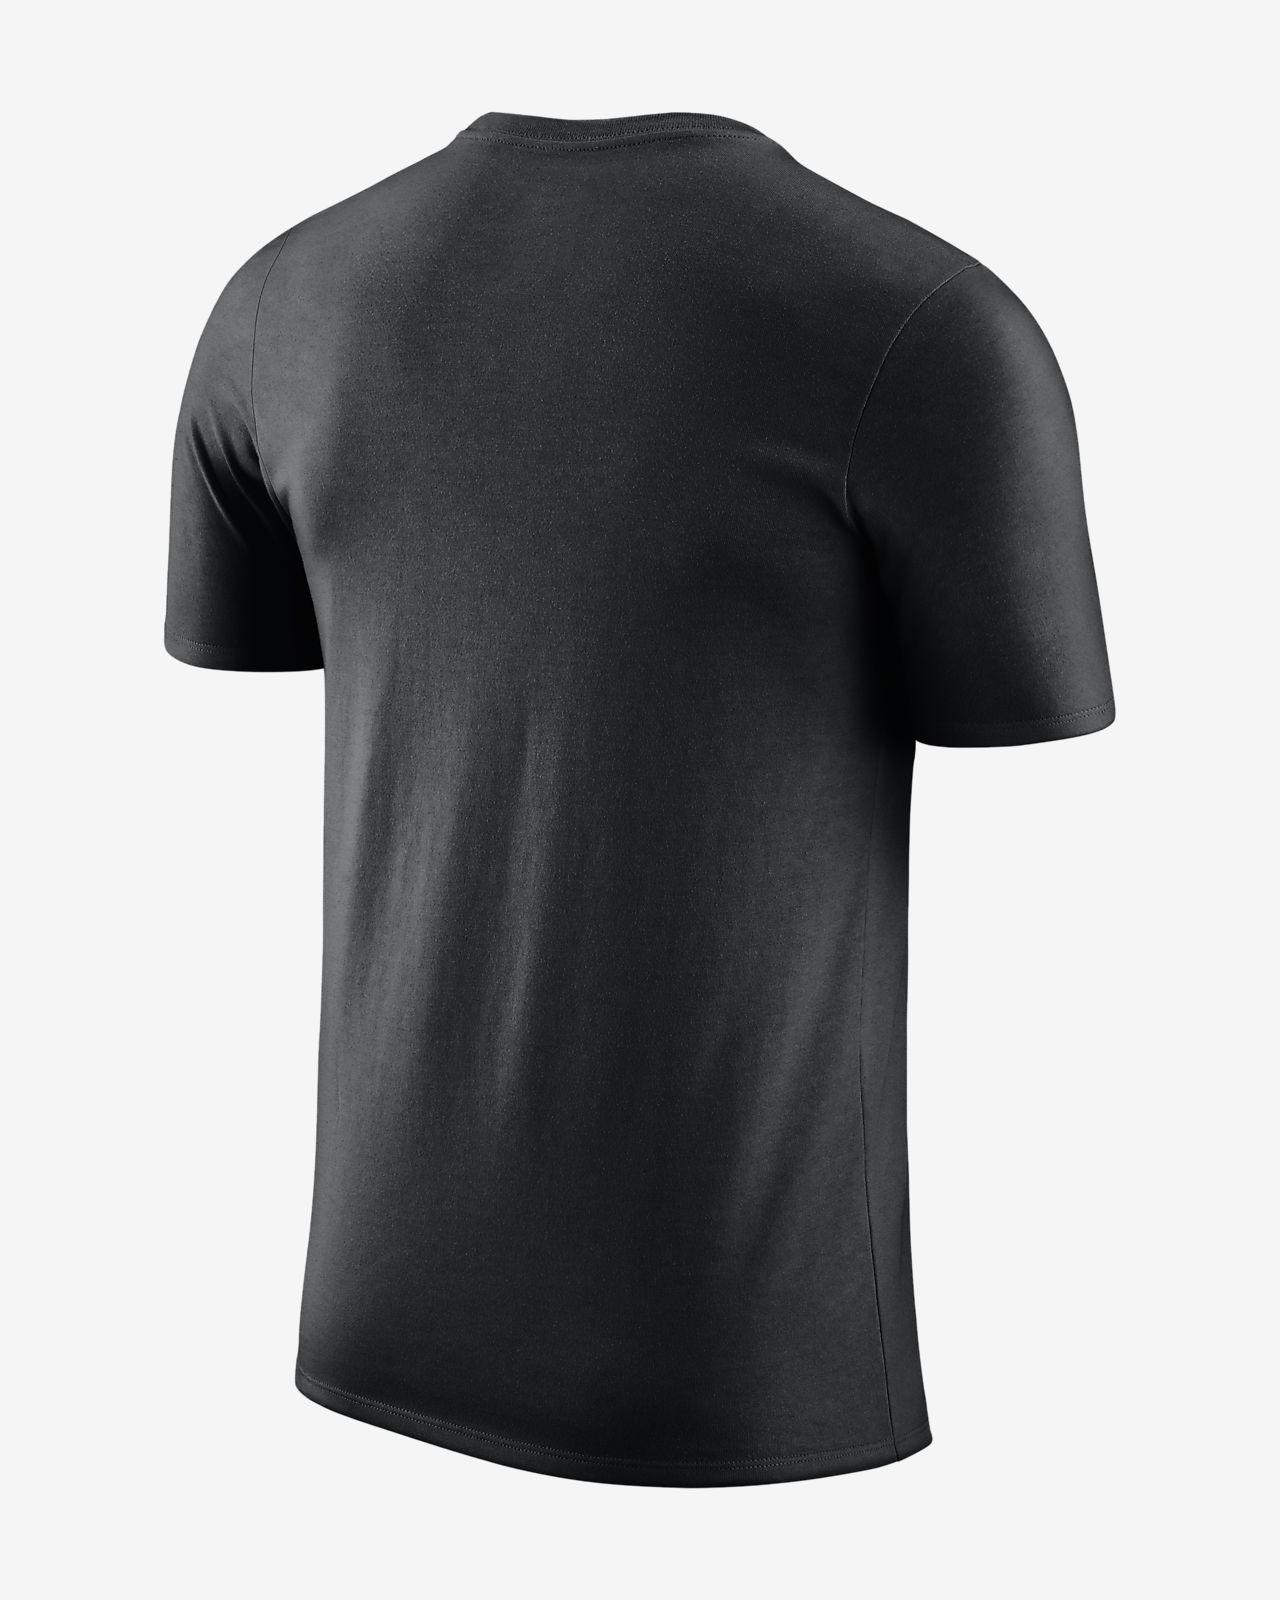 26d18d87 Milwaukee Bucks Nike Dri-FIT Men's NBA T-Shirt